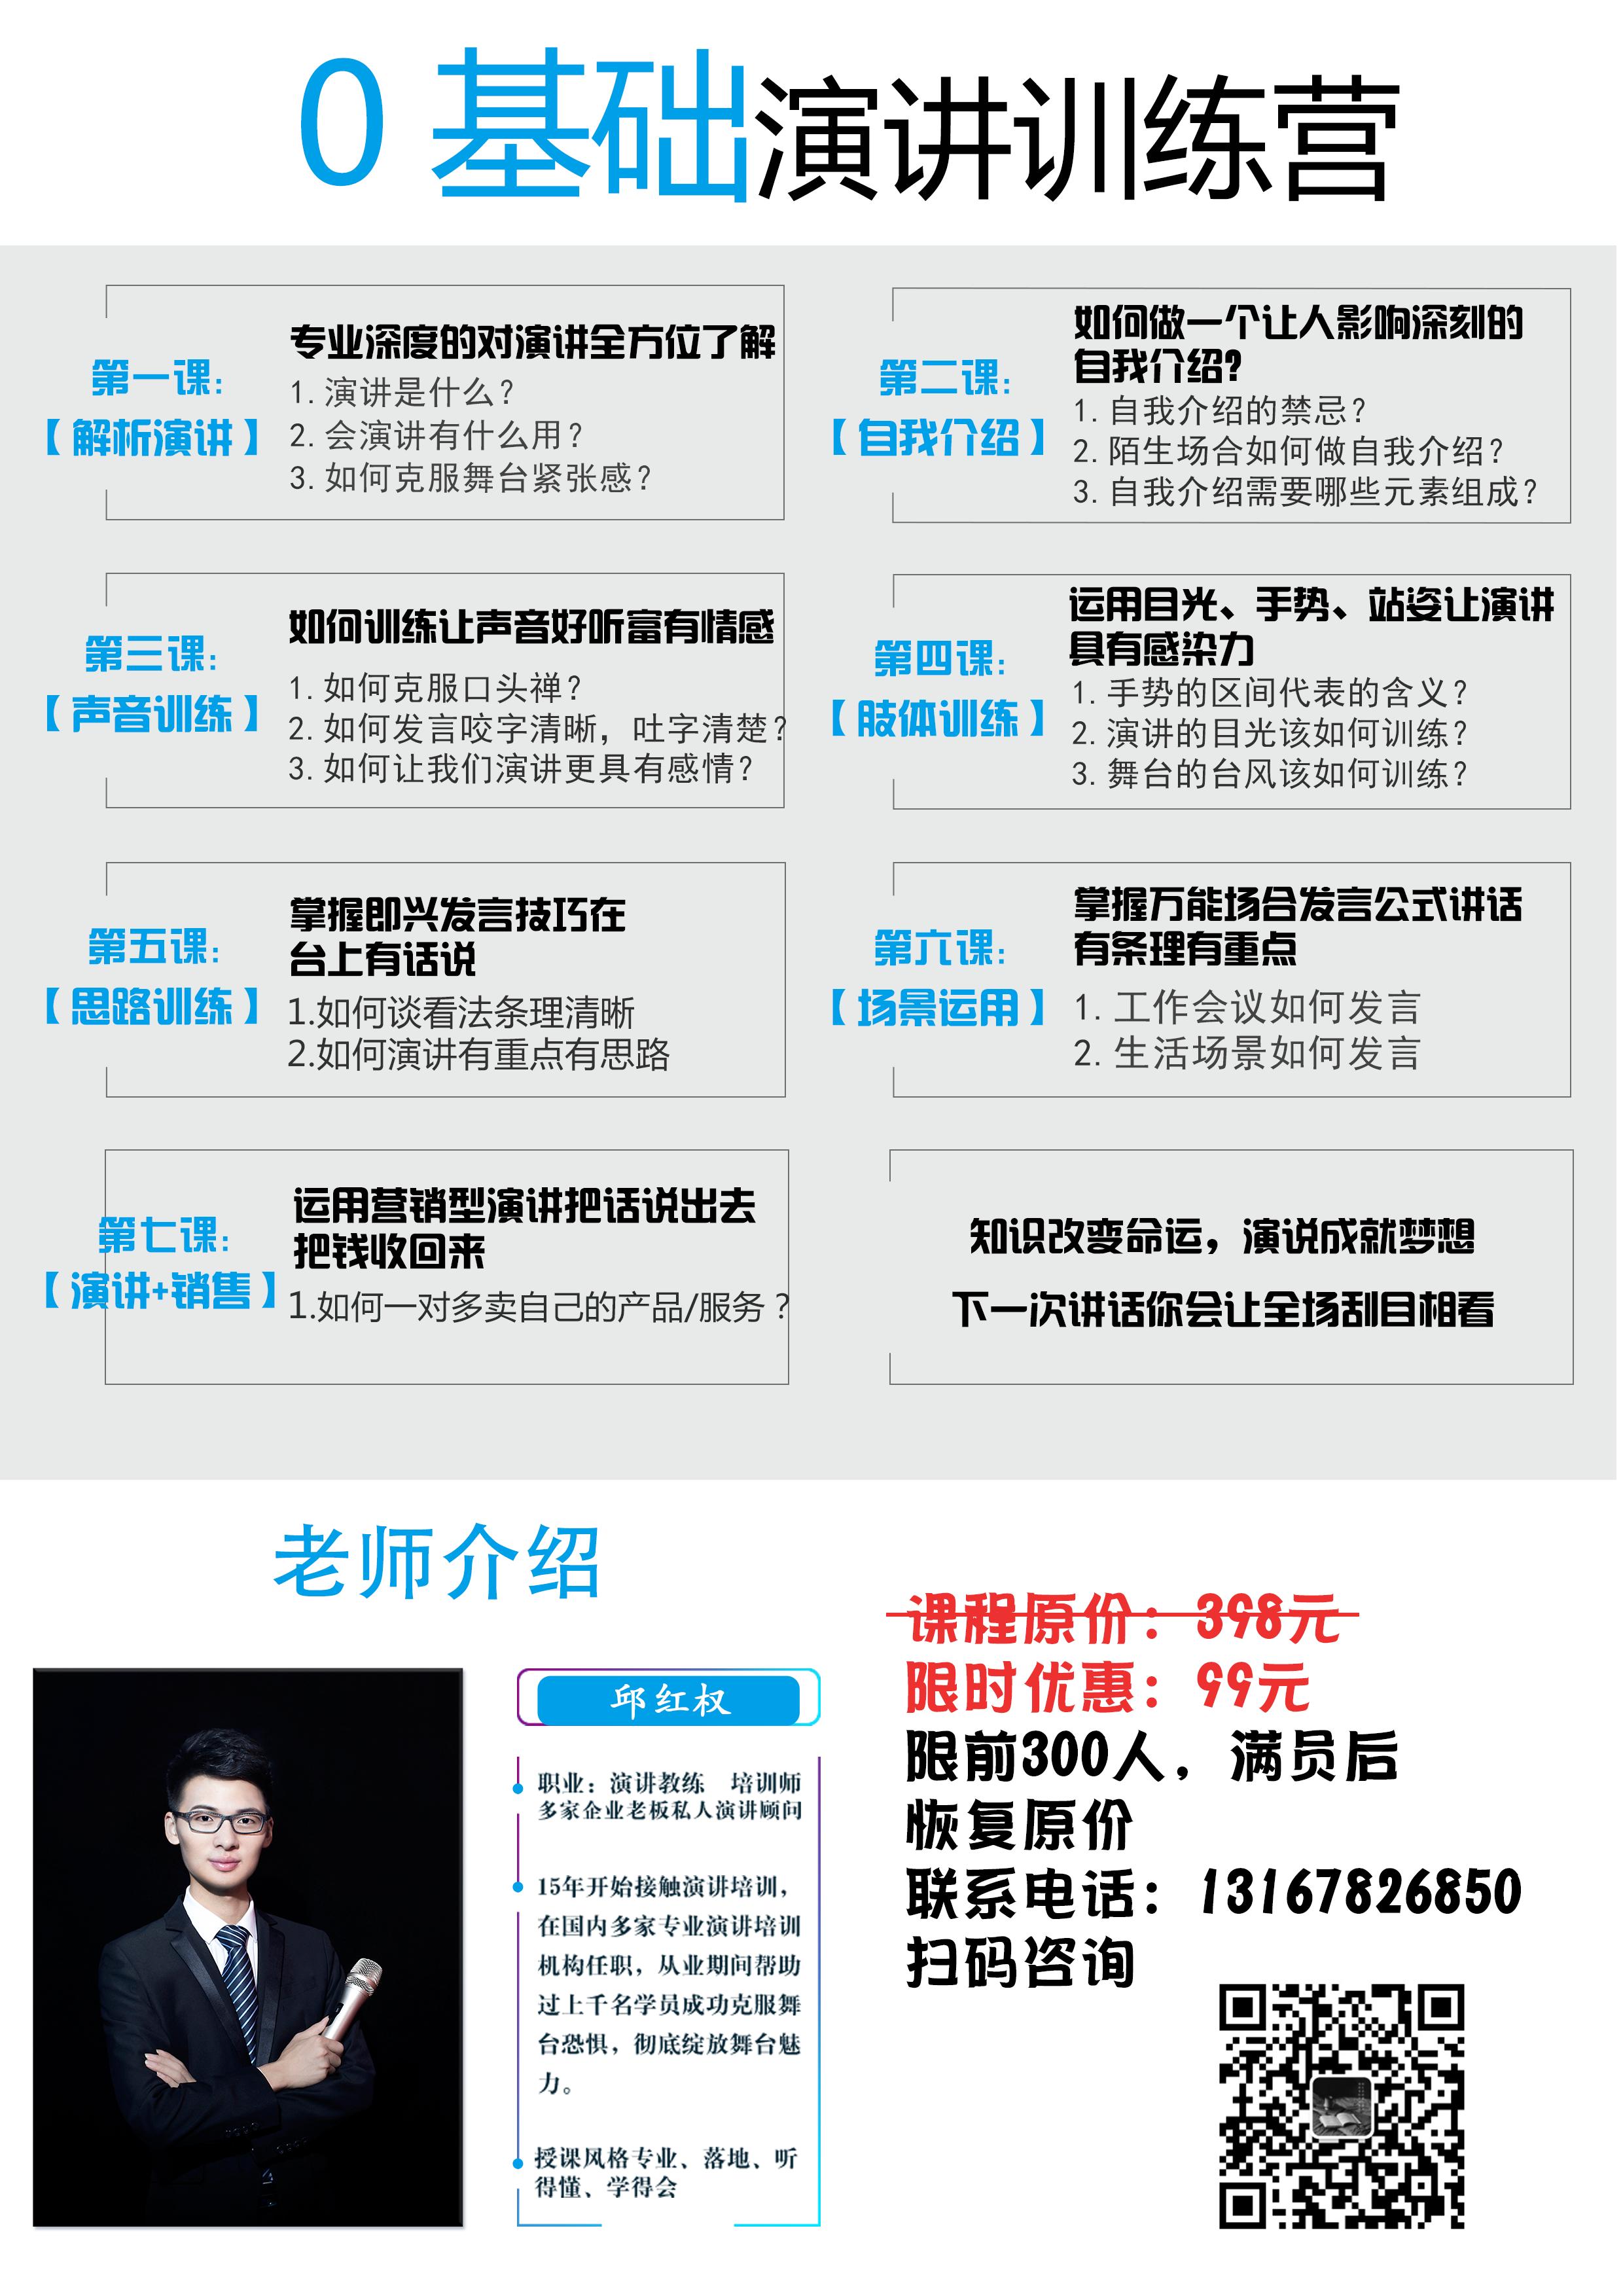 http://www.huodongxing.com/file/20170815/2402783512417/673184739910366.png